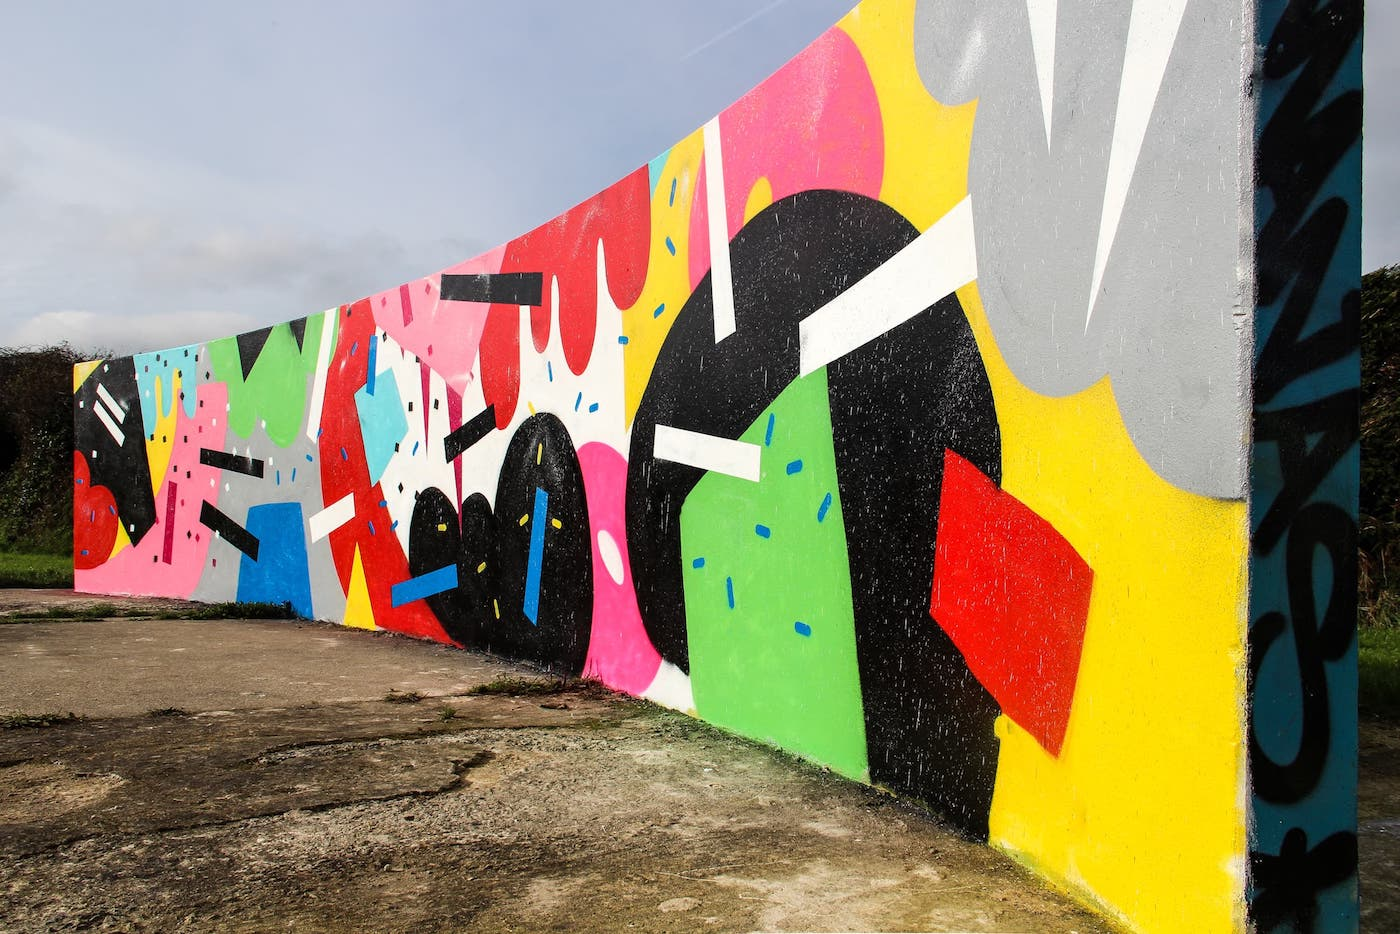 callington-cornwall-street-art-mural